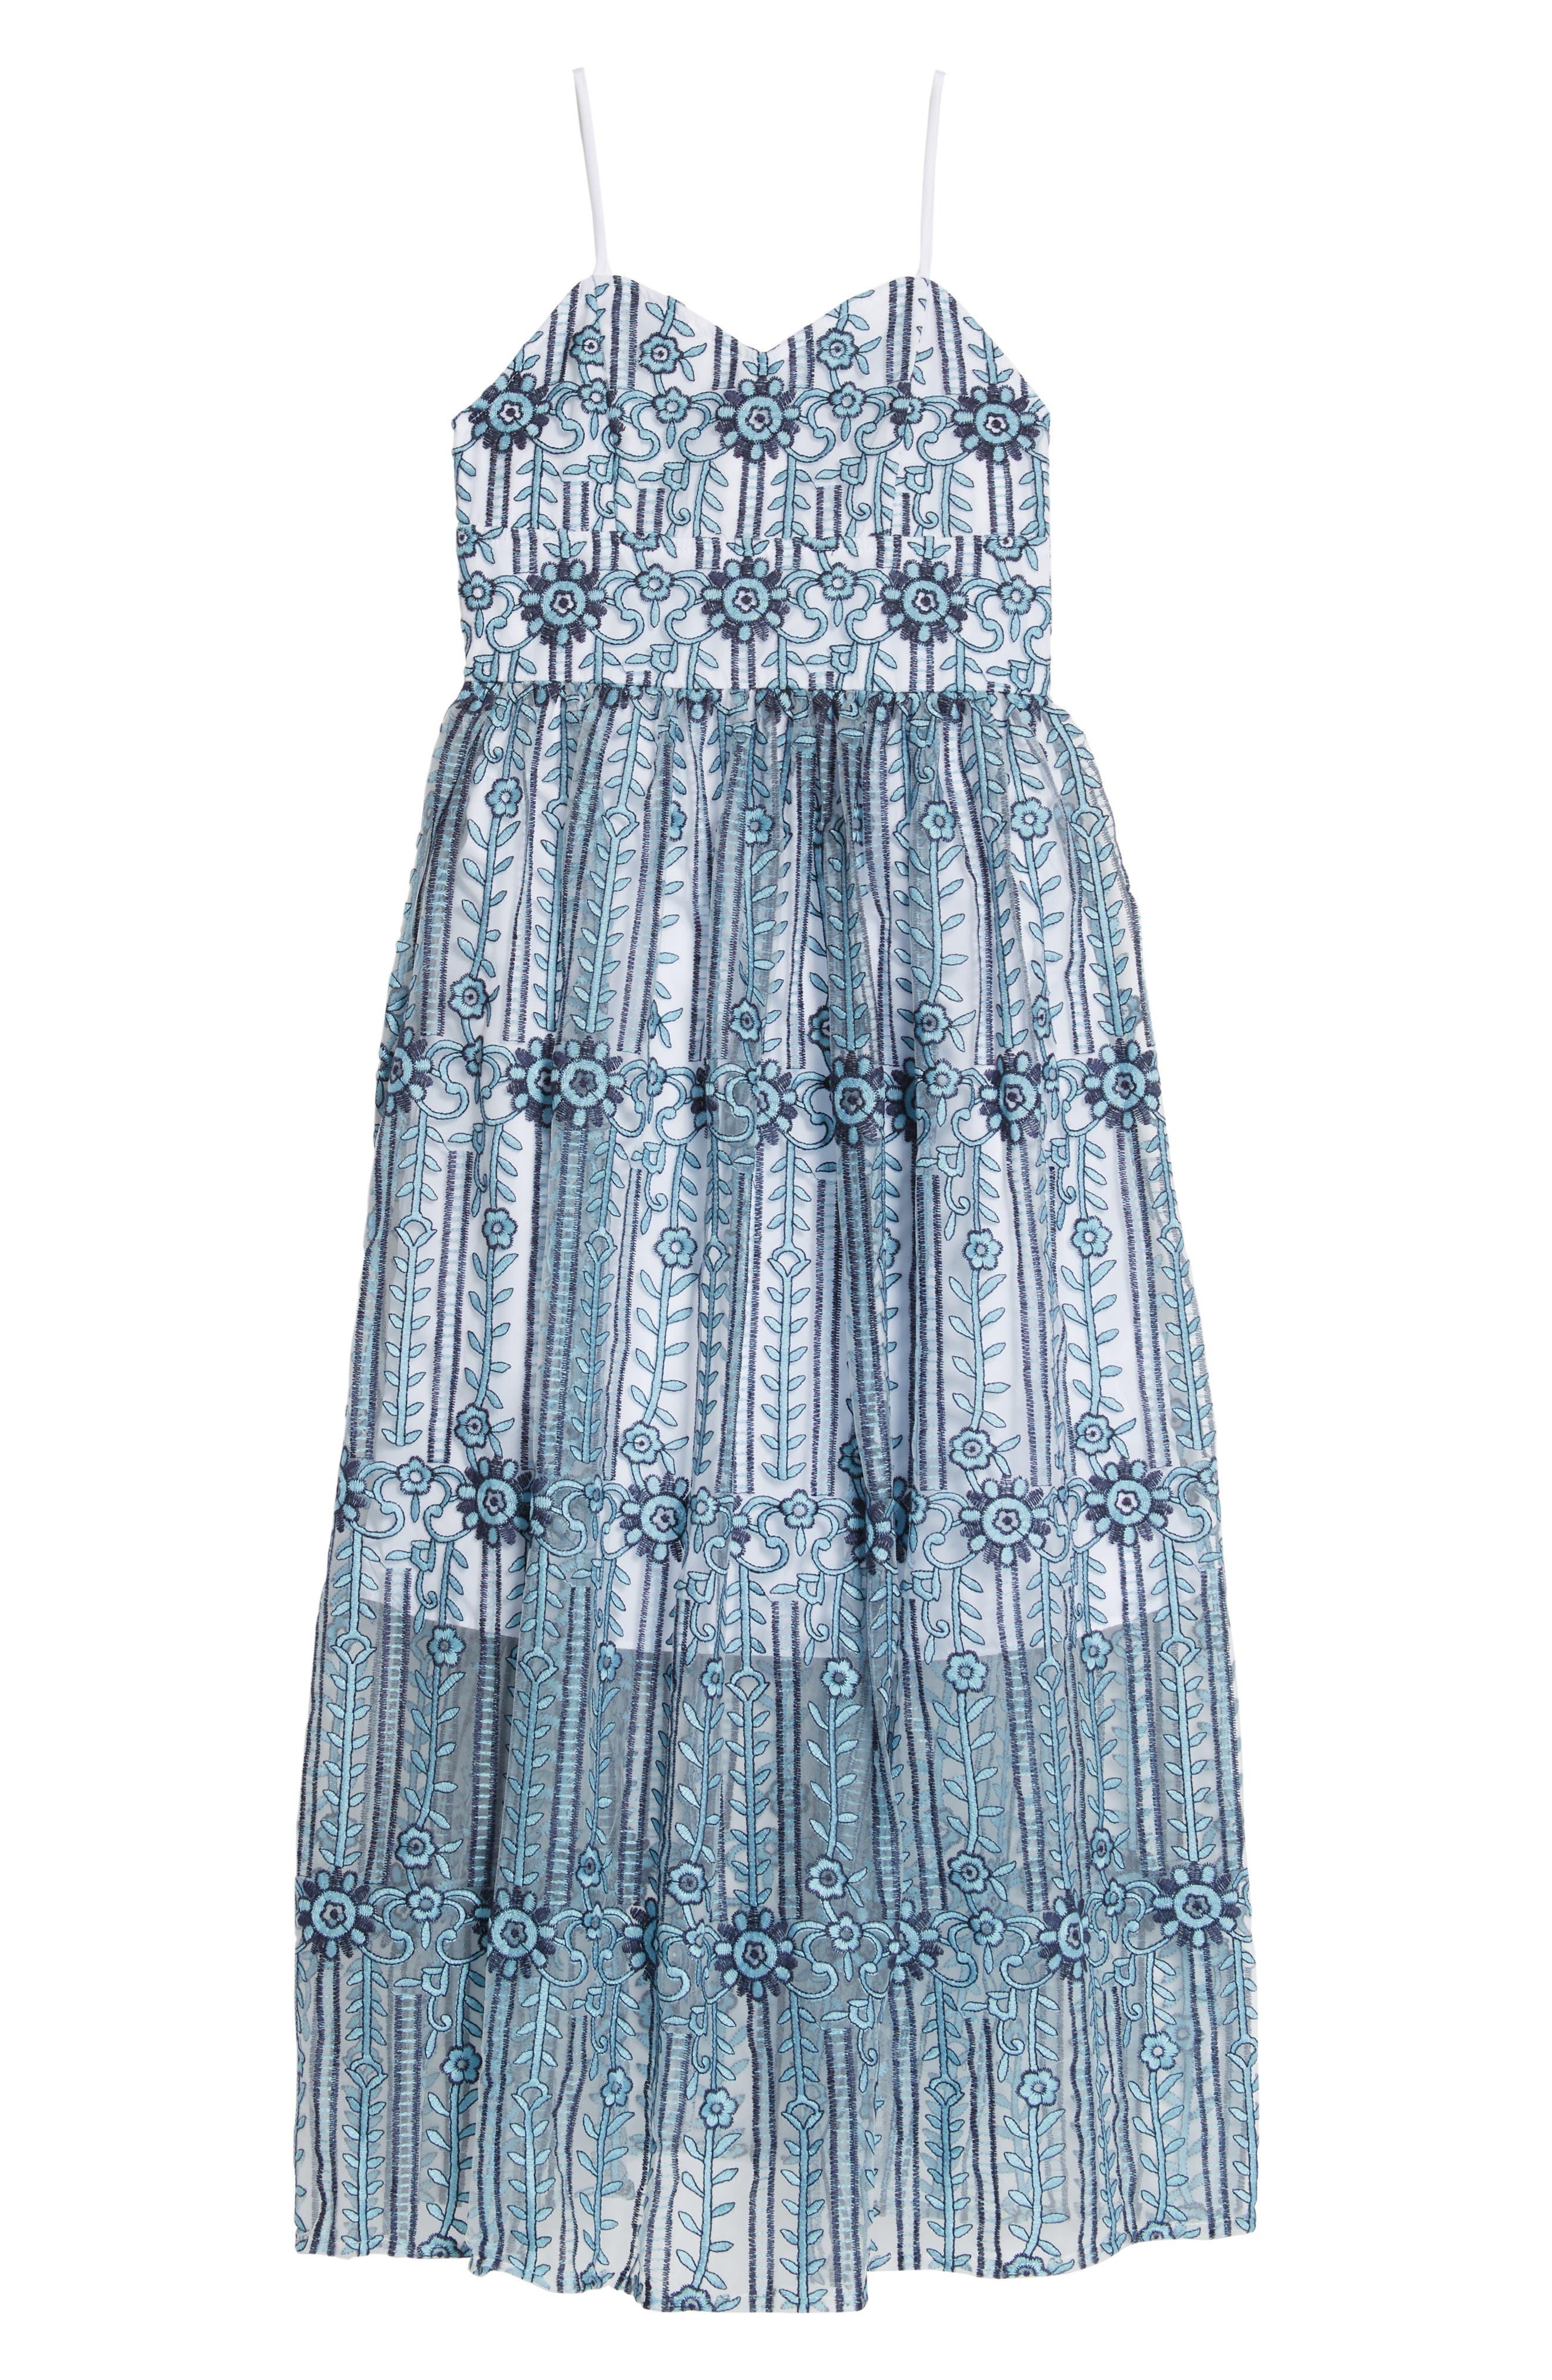 Embroidered Maxi Dress,                             Main thumbnail 1, color,                             400